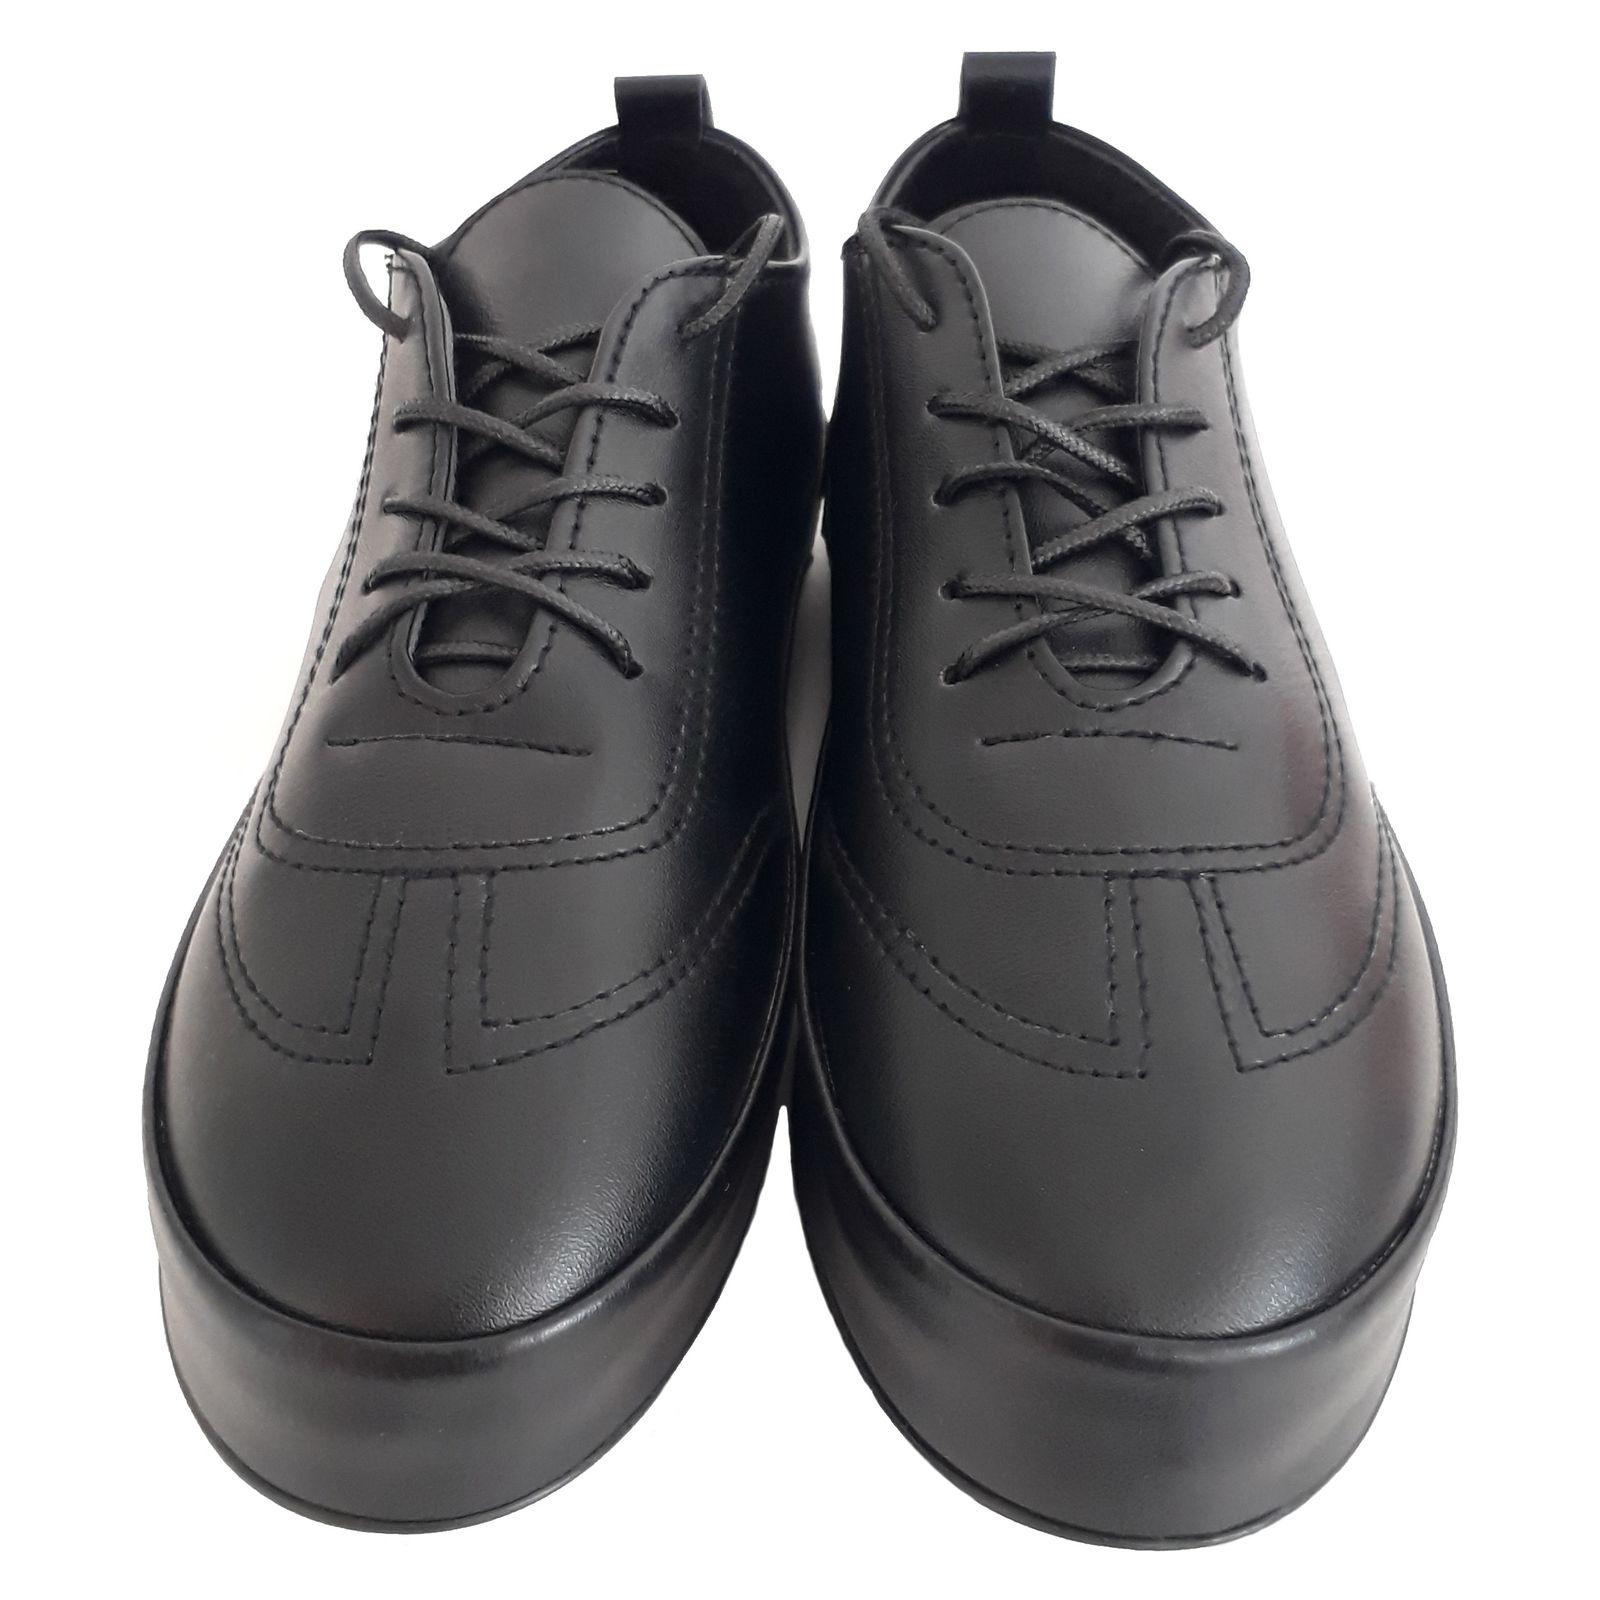 کفش روزمره زنانه کد 1 -  - 4